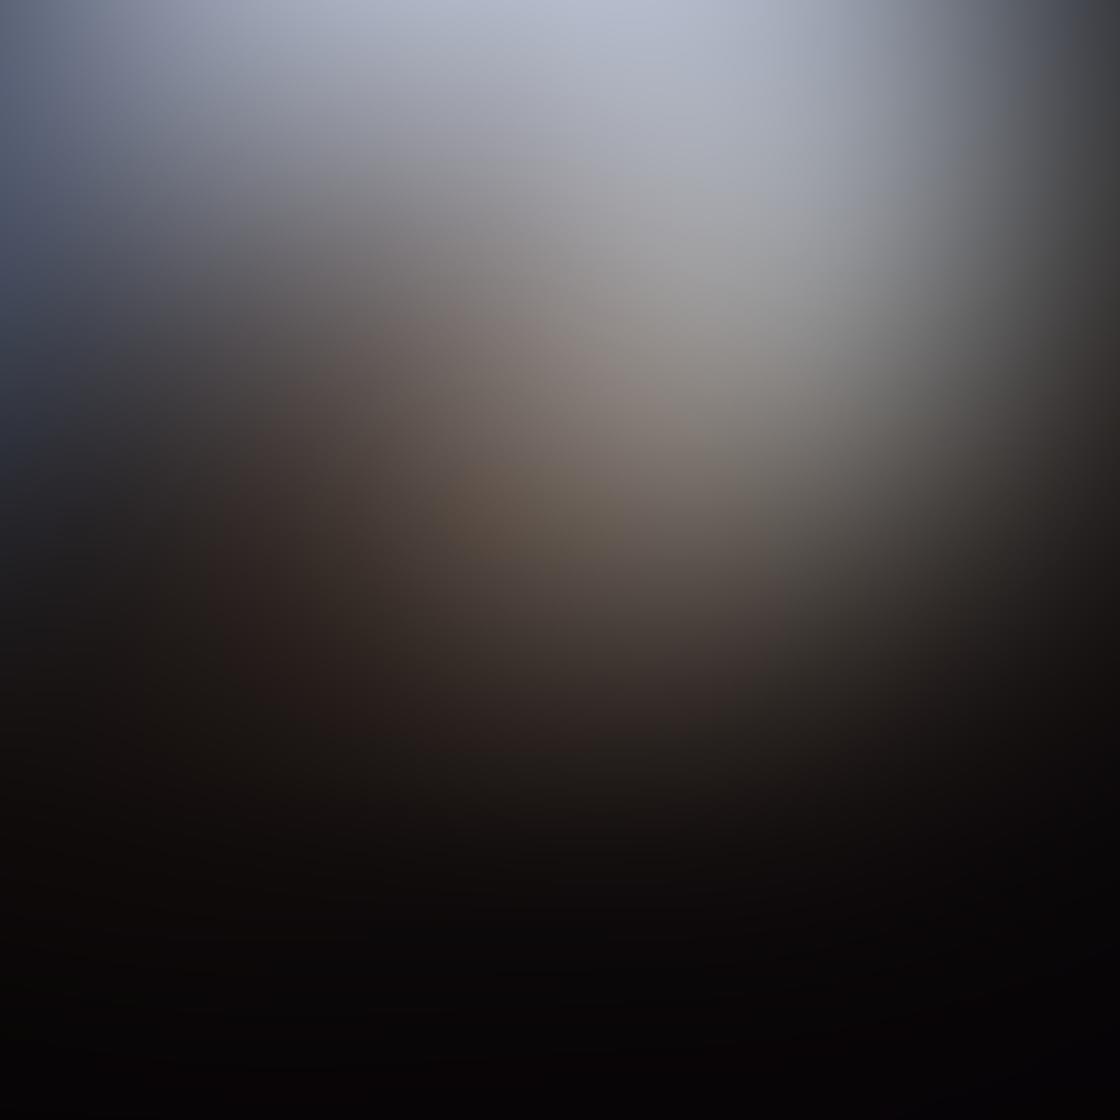 iPhone Photos Lens Flare 12